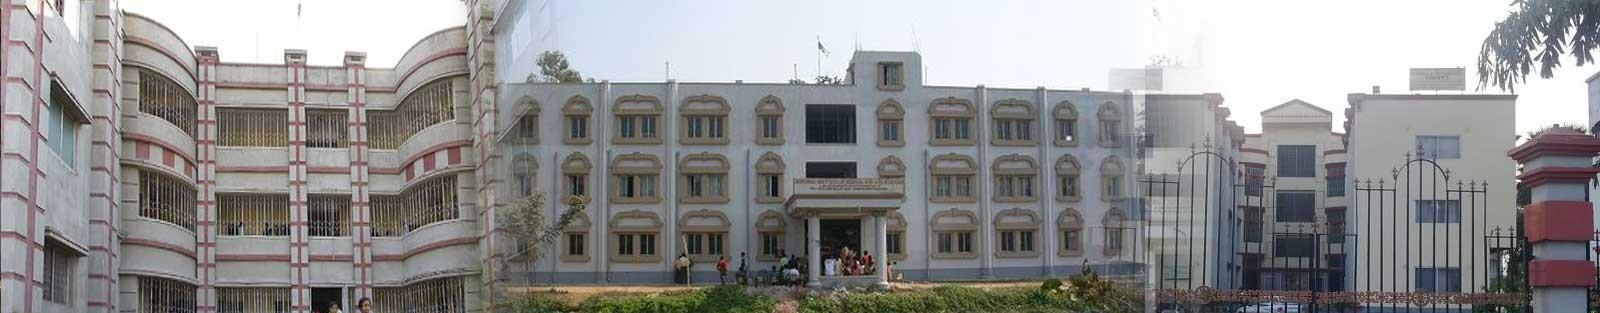 Burdwan Institute of Medical and Life Sciences - BIMLS, Bardhaman Image